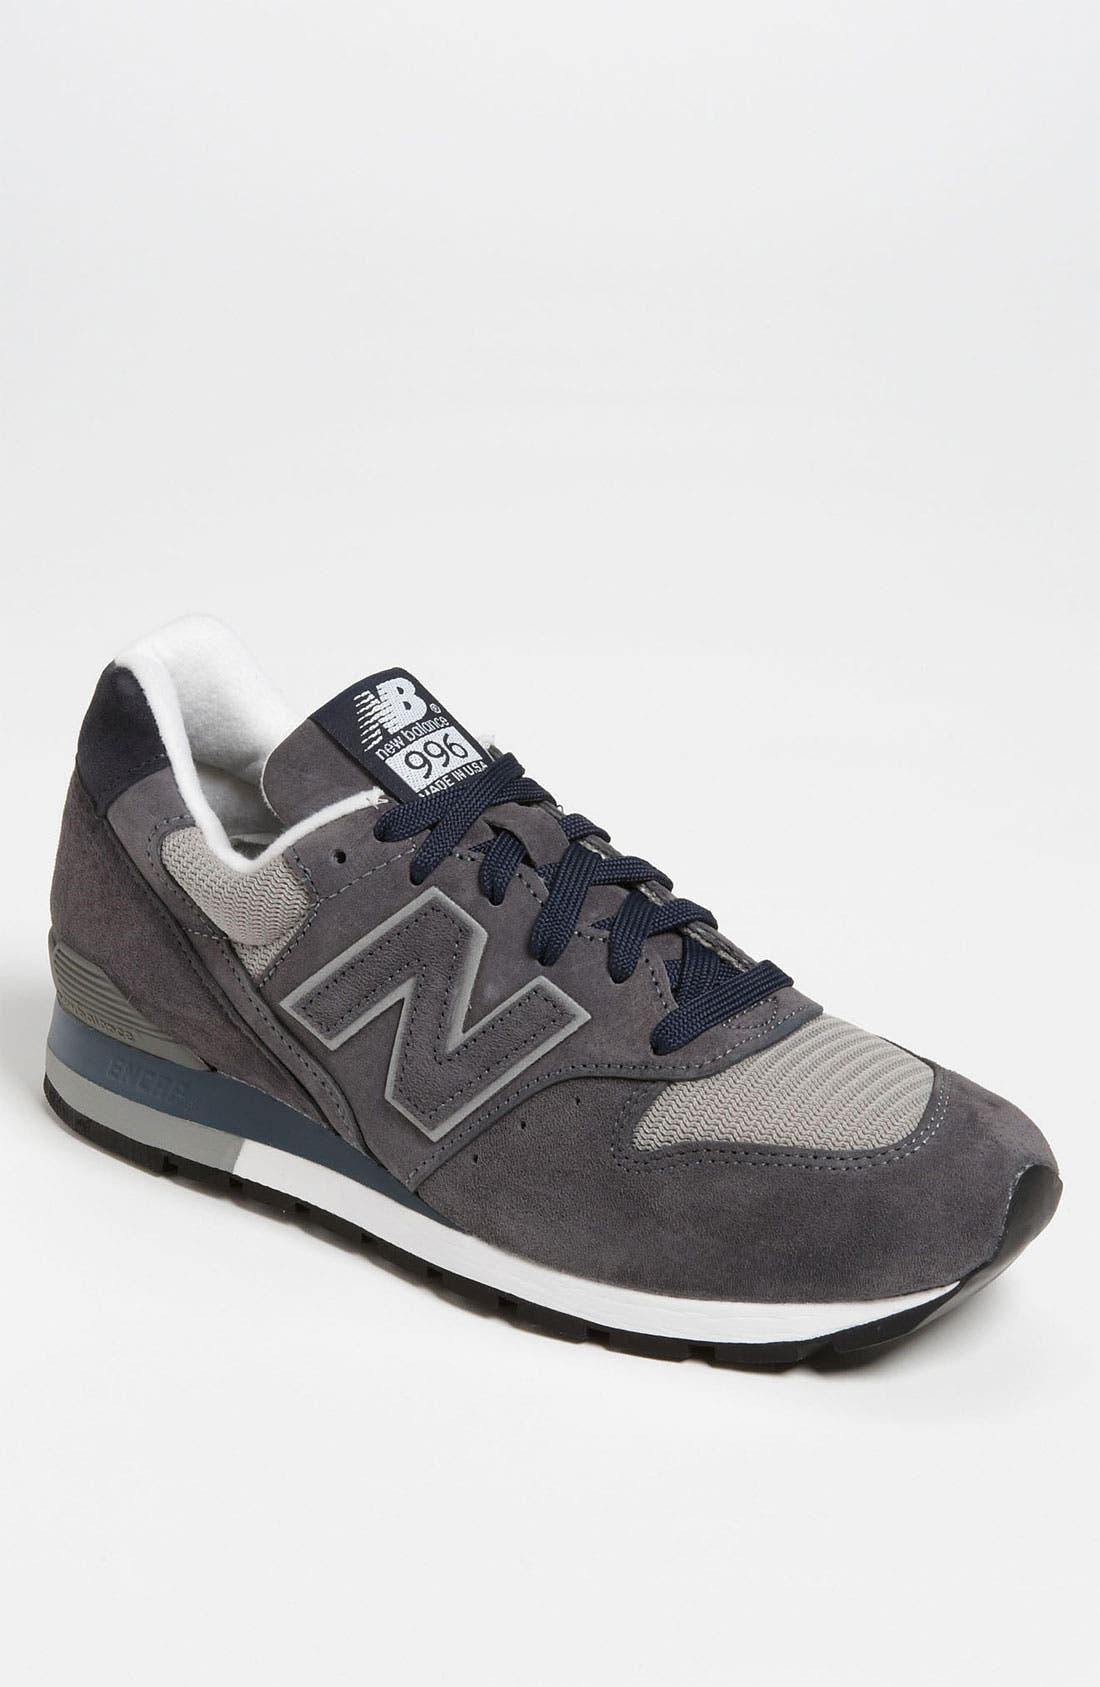 Alternate Image 1 Selected - New Balance '996' Sneaker (Men) (Online Only)